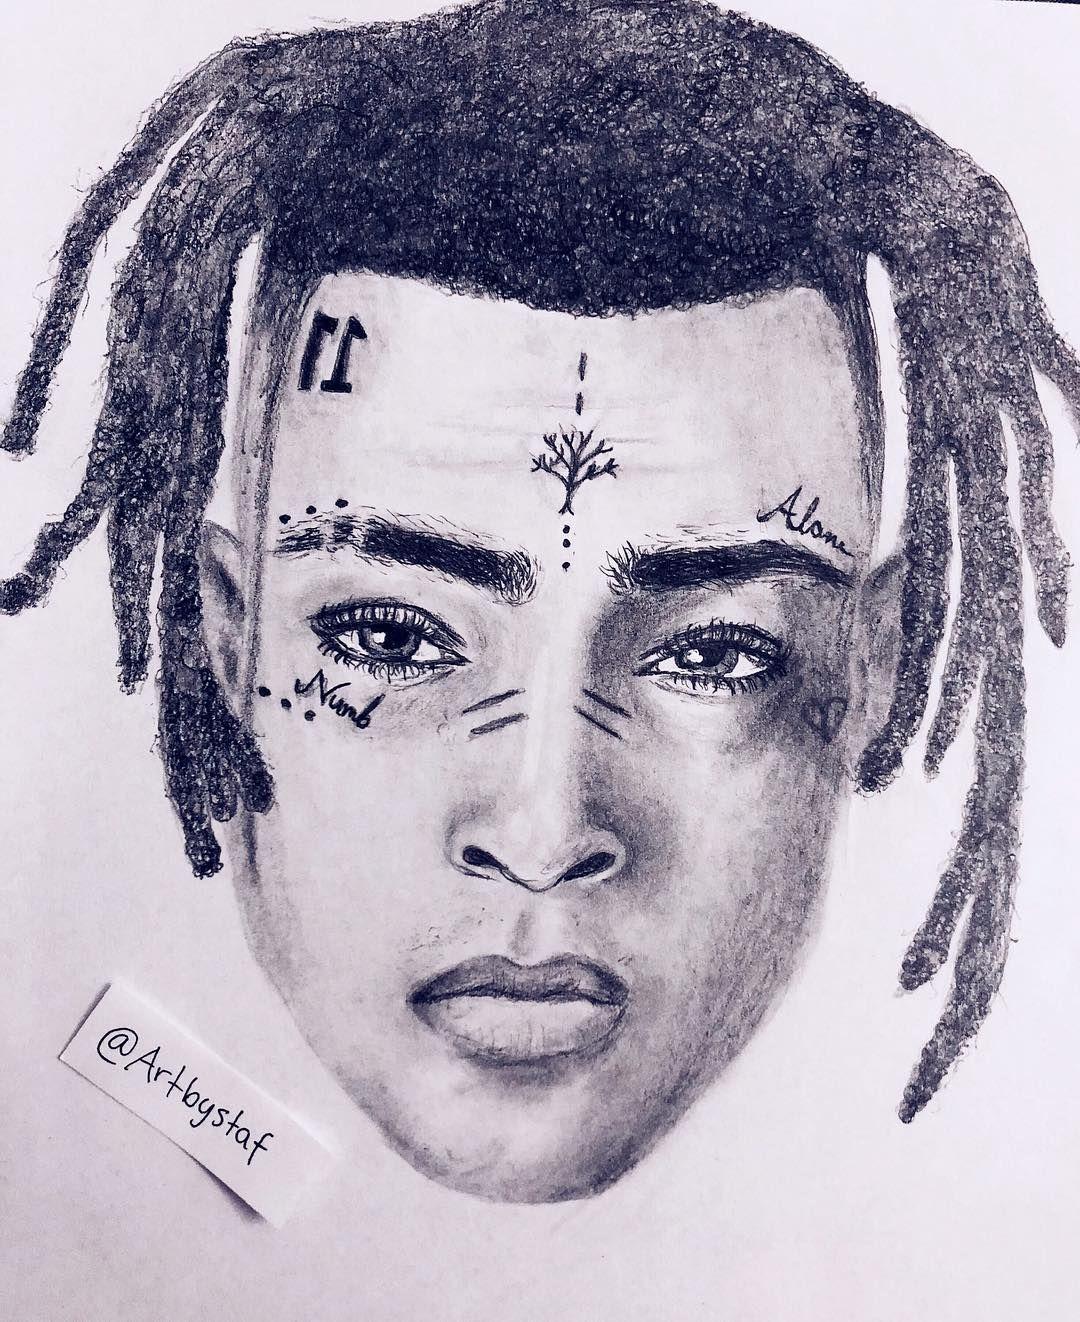 Drawing Xxxtentacion: @xxxtentacion XXXTENTACION. Rest In Peace.